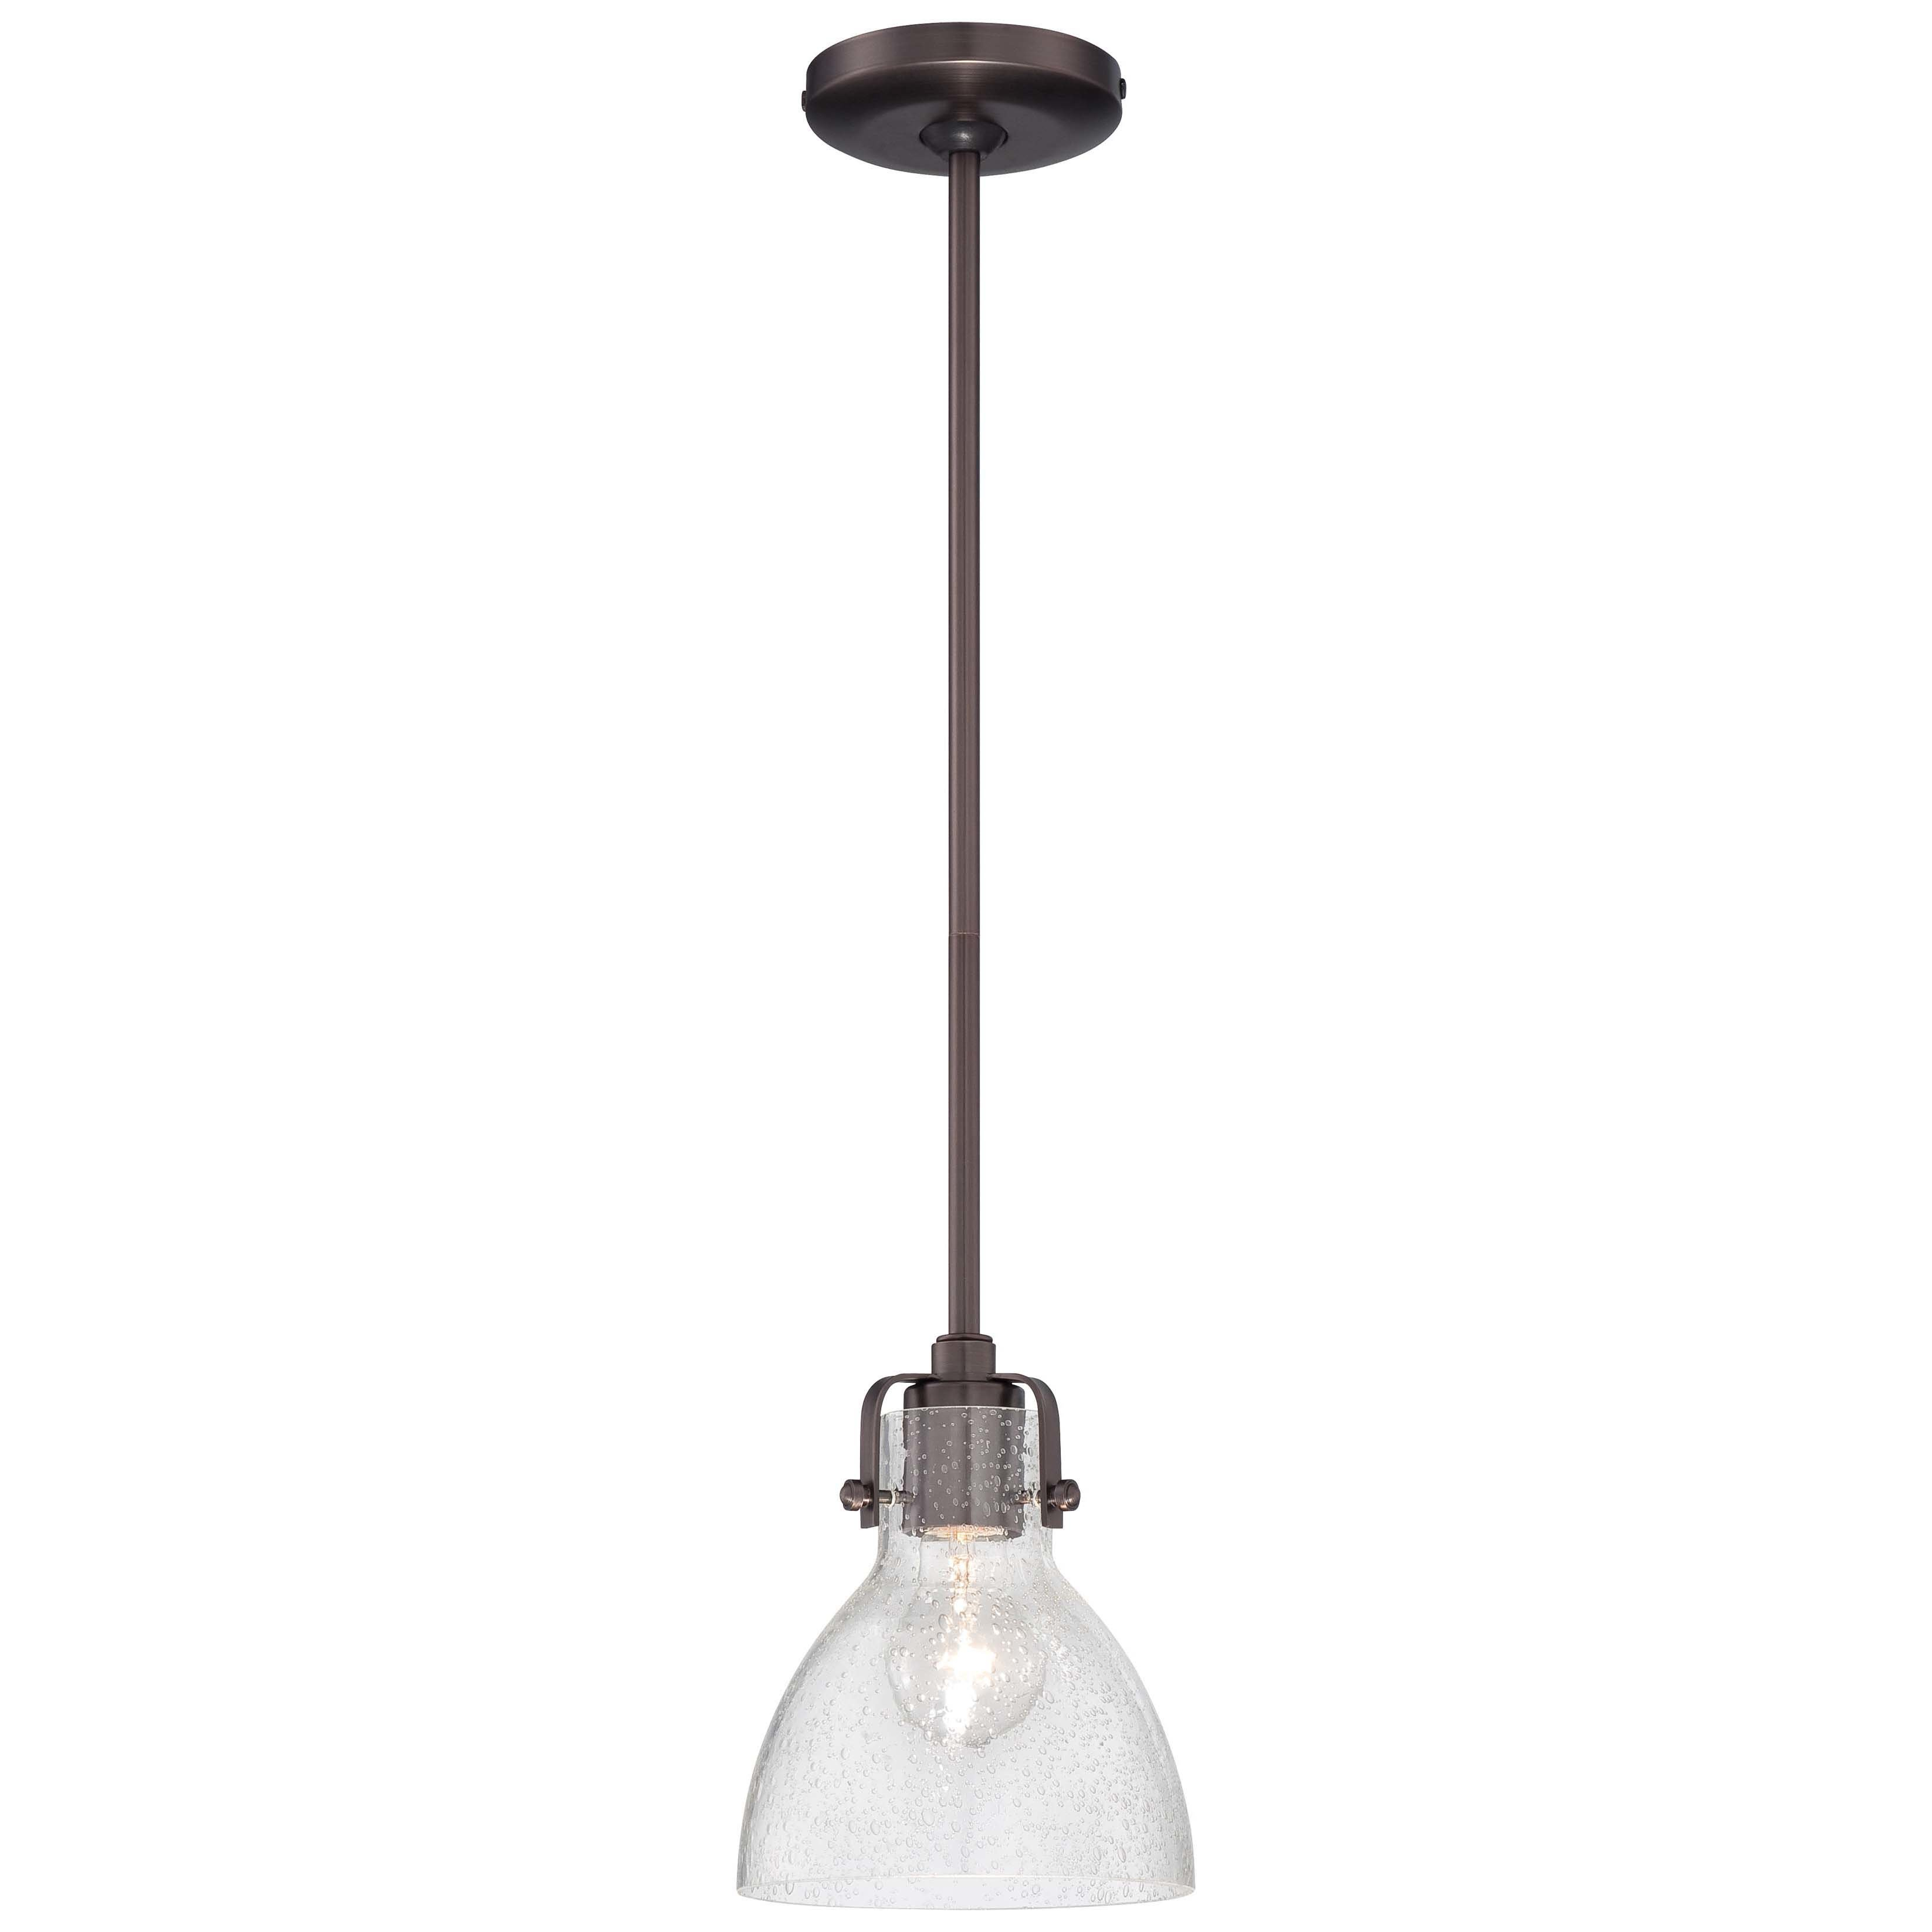 Goldie 1 Light Single Bell Pendant Intended For Monadnock 1 Light Single Dome Pendants (View 14 of 30)